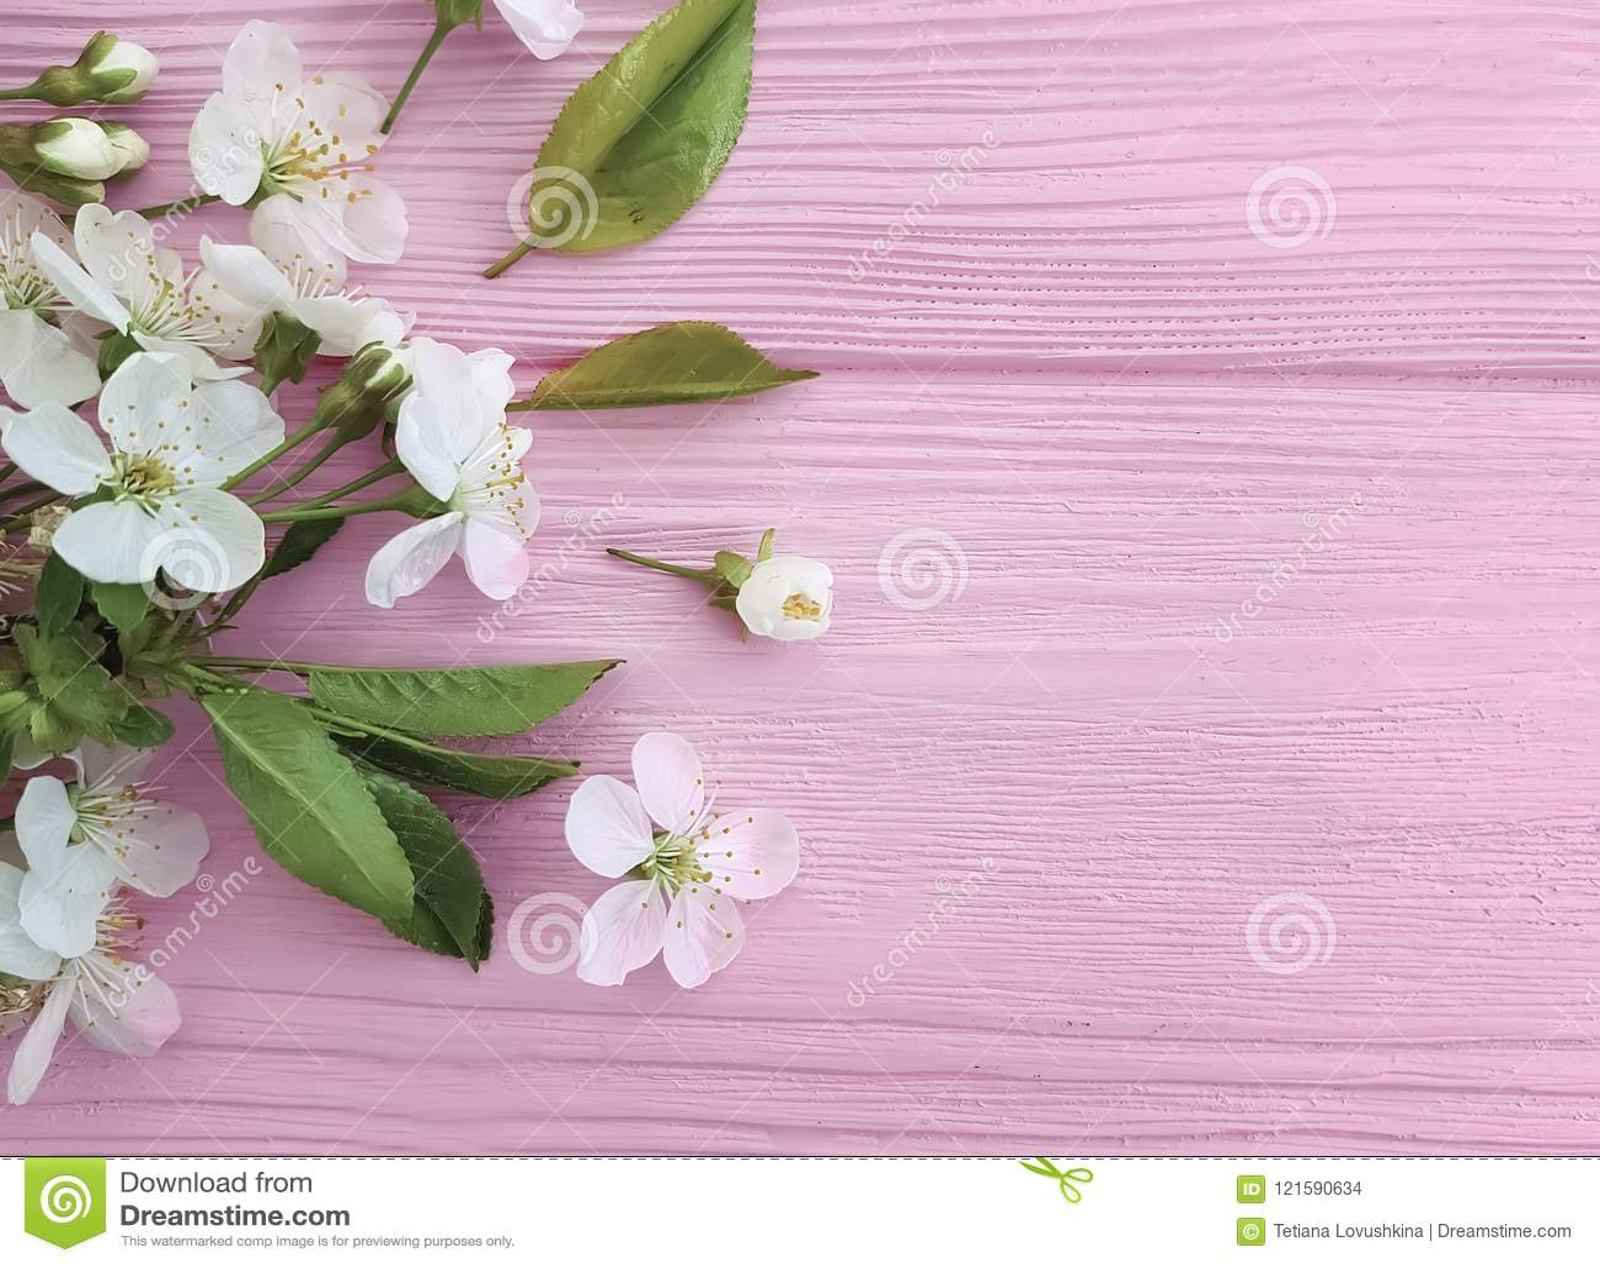 Cherry blossom on pink wooden decoration color border retro design pastel frame background